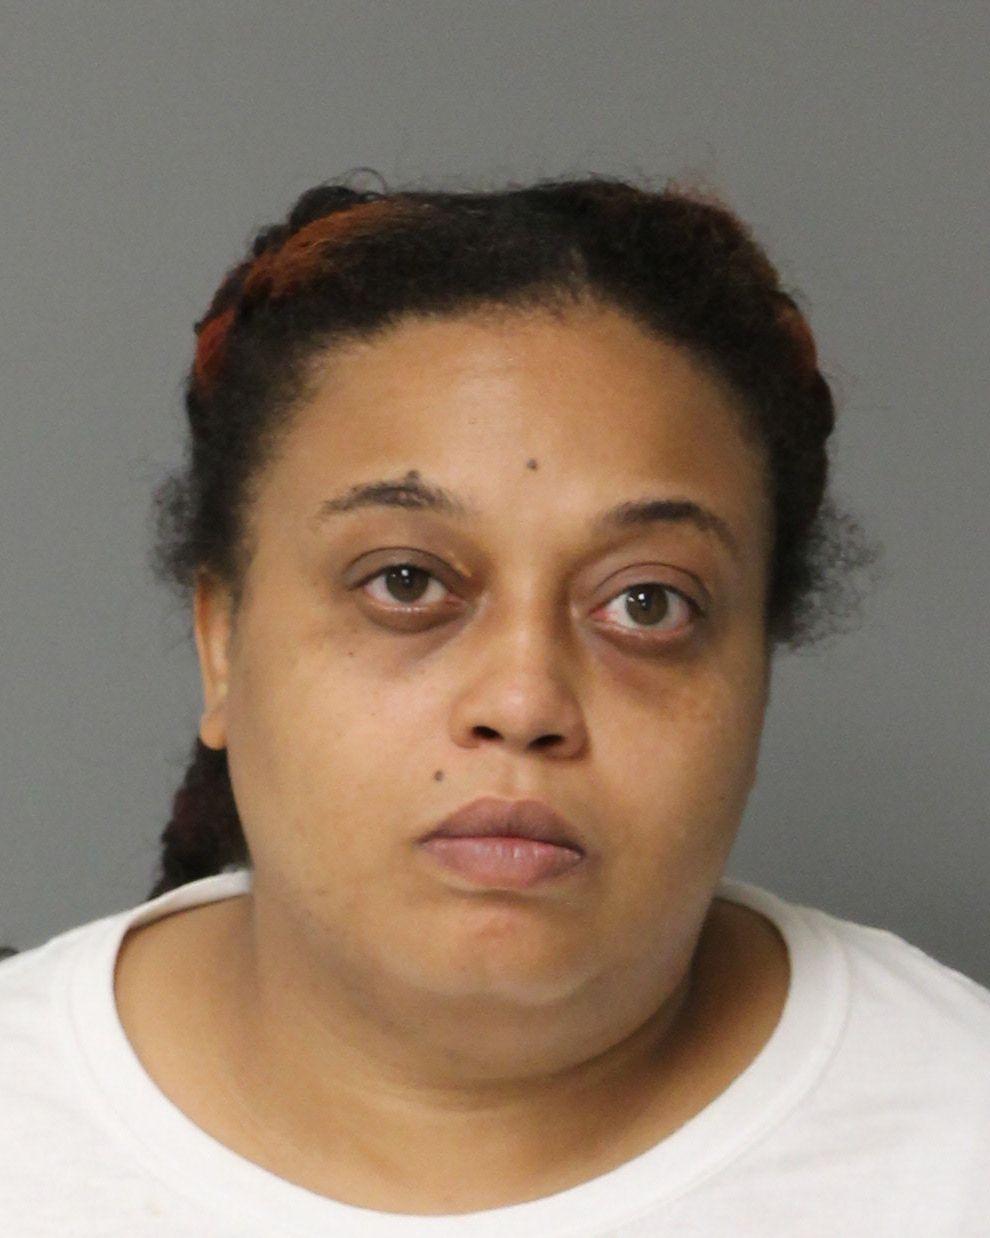 ROBERTA RONTEA RICHARDSON Mugshot / County Arrests / Wake County Arrests